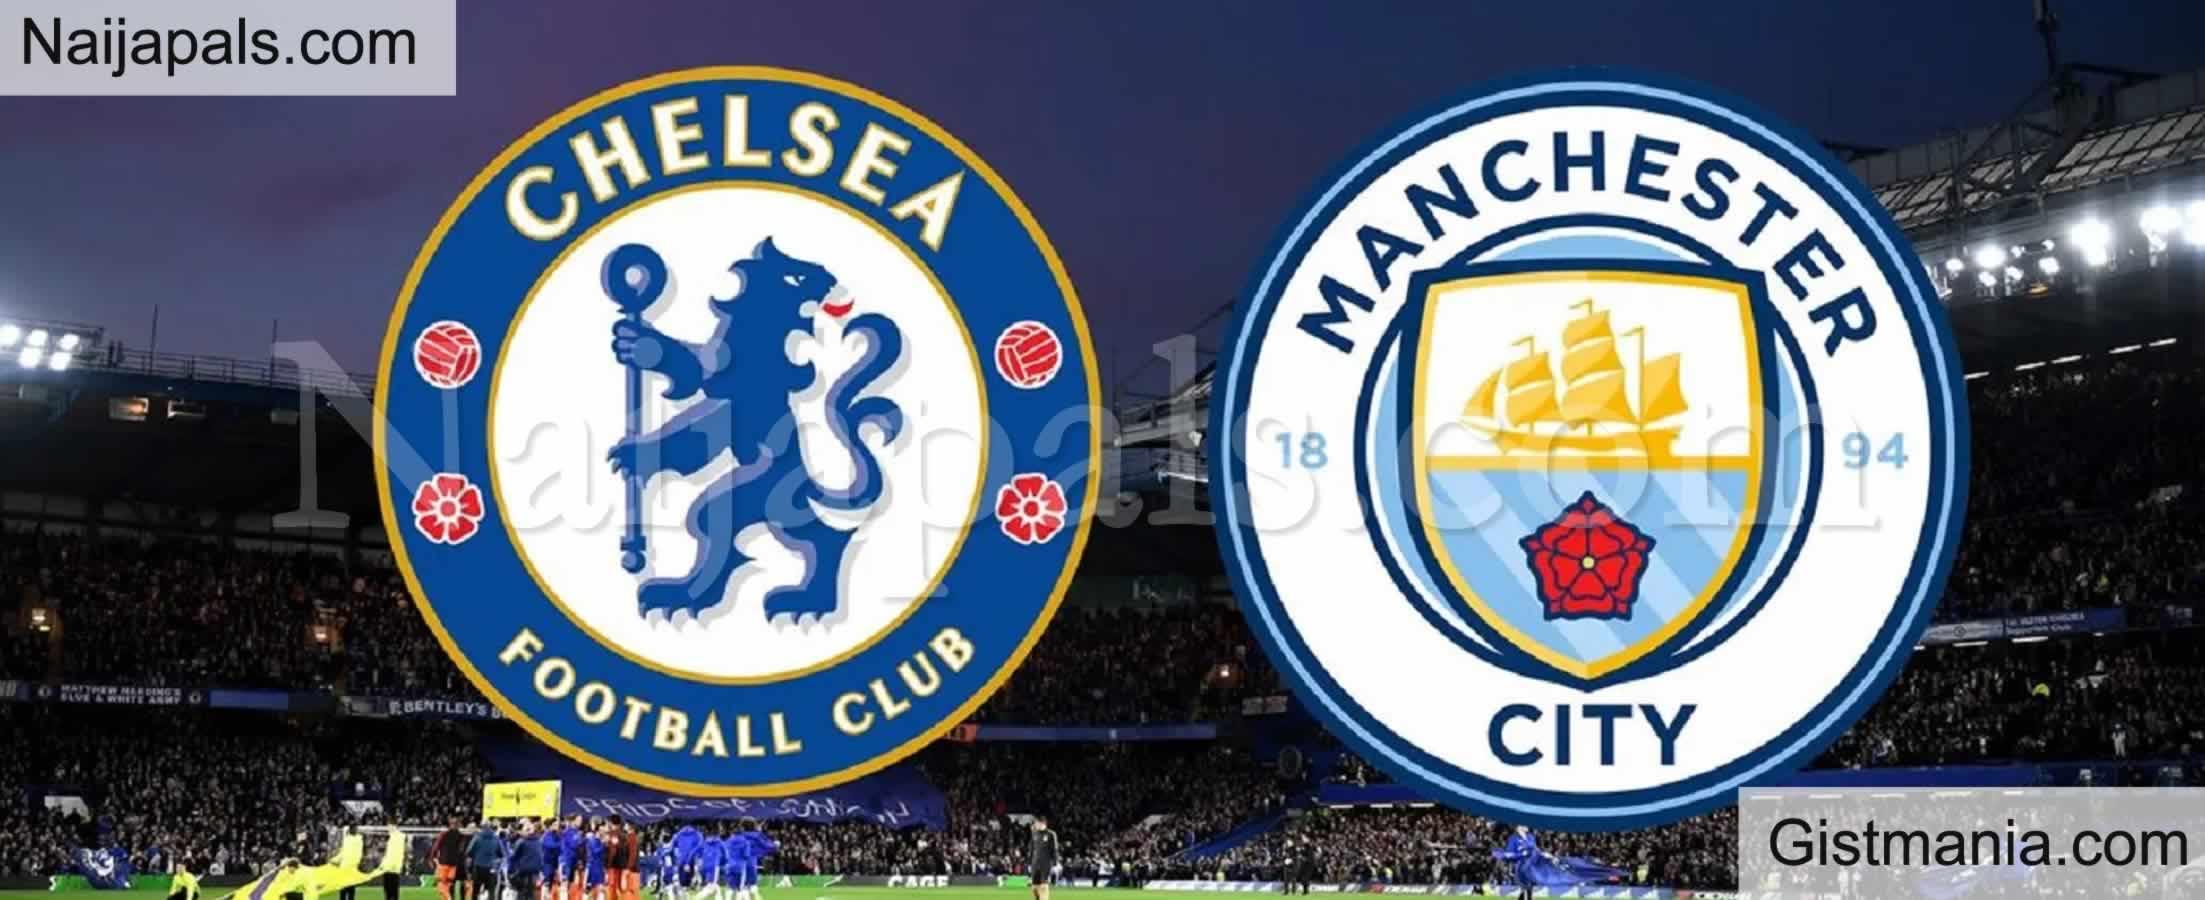 <img alt='.' class='lazyload' data-src='https://img.gistmania.com/emot/soccer.gif' /> <b>Chelsea v Manchester City : English Premier League Match, Team News, Goal Scorers and Stats</b>